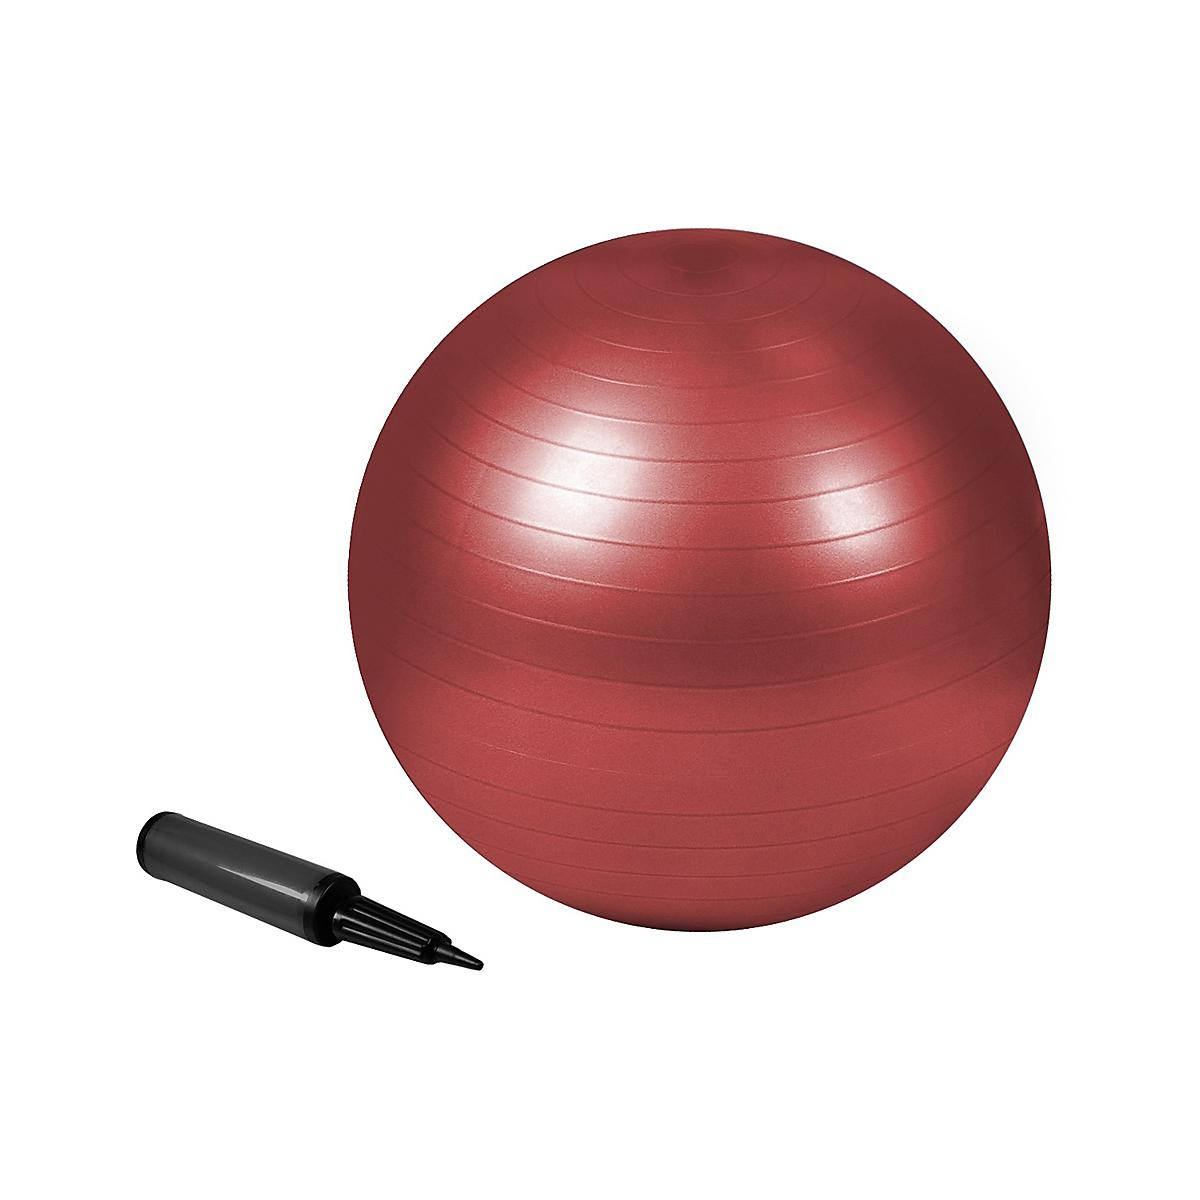 Trimax�Zenzation 55cm exercise ball